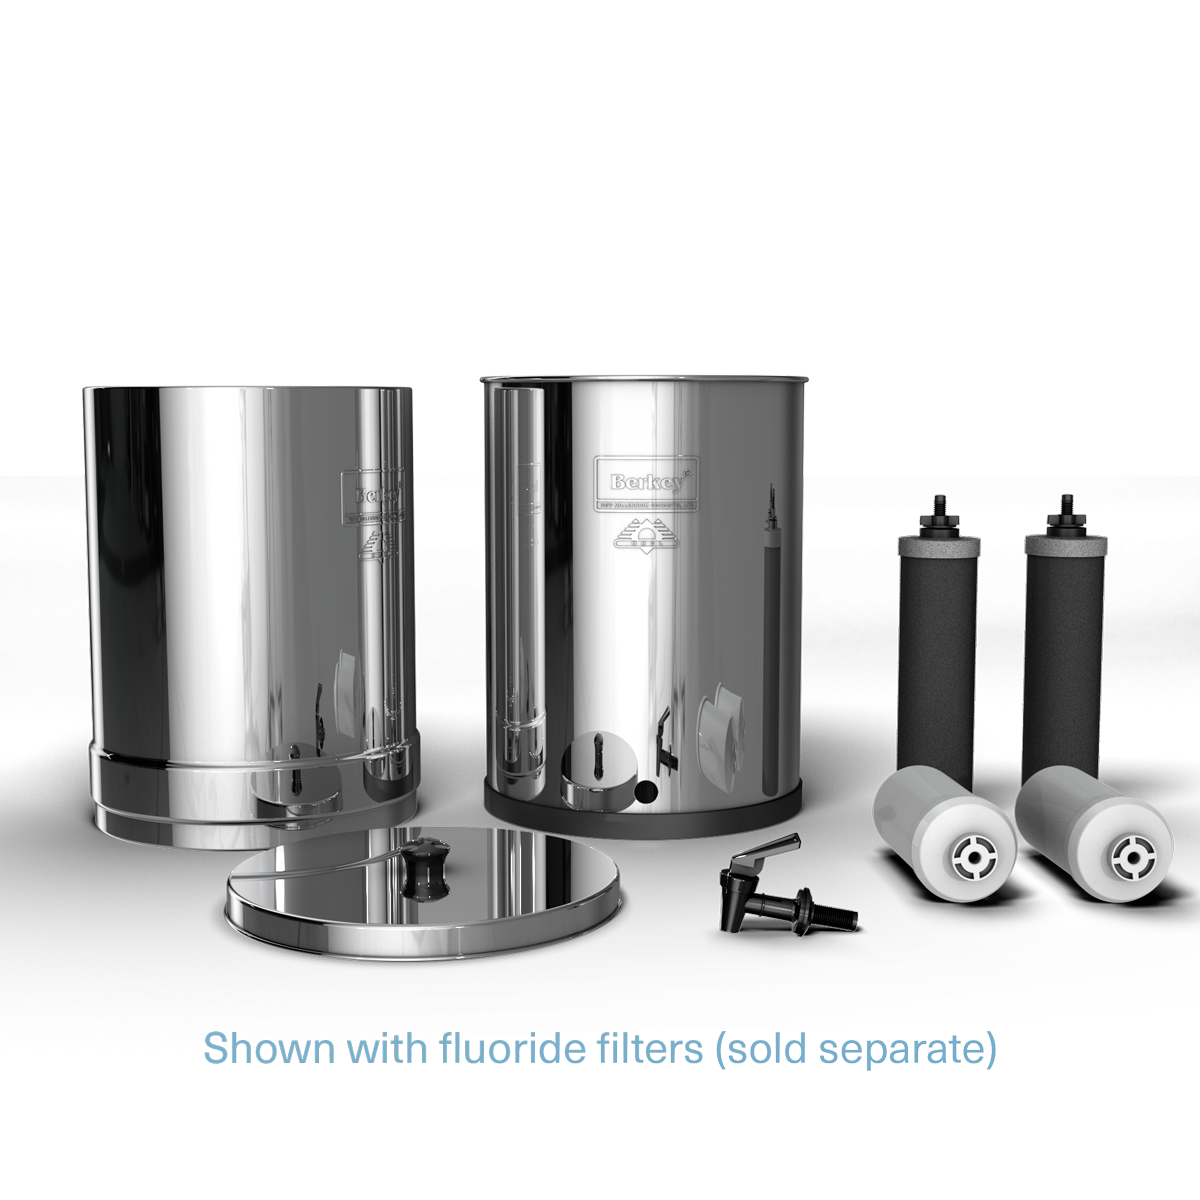 Berkey Water Filters Imperial Berkey Water Purification System